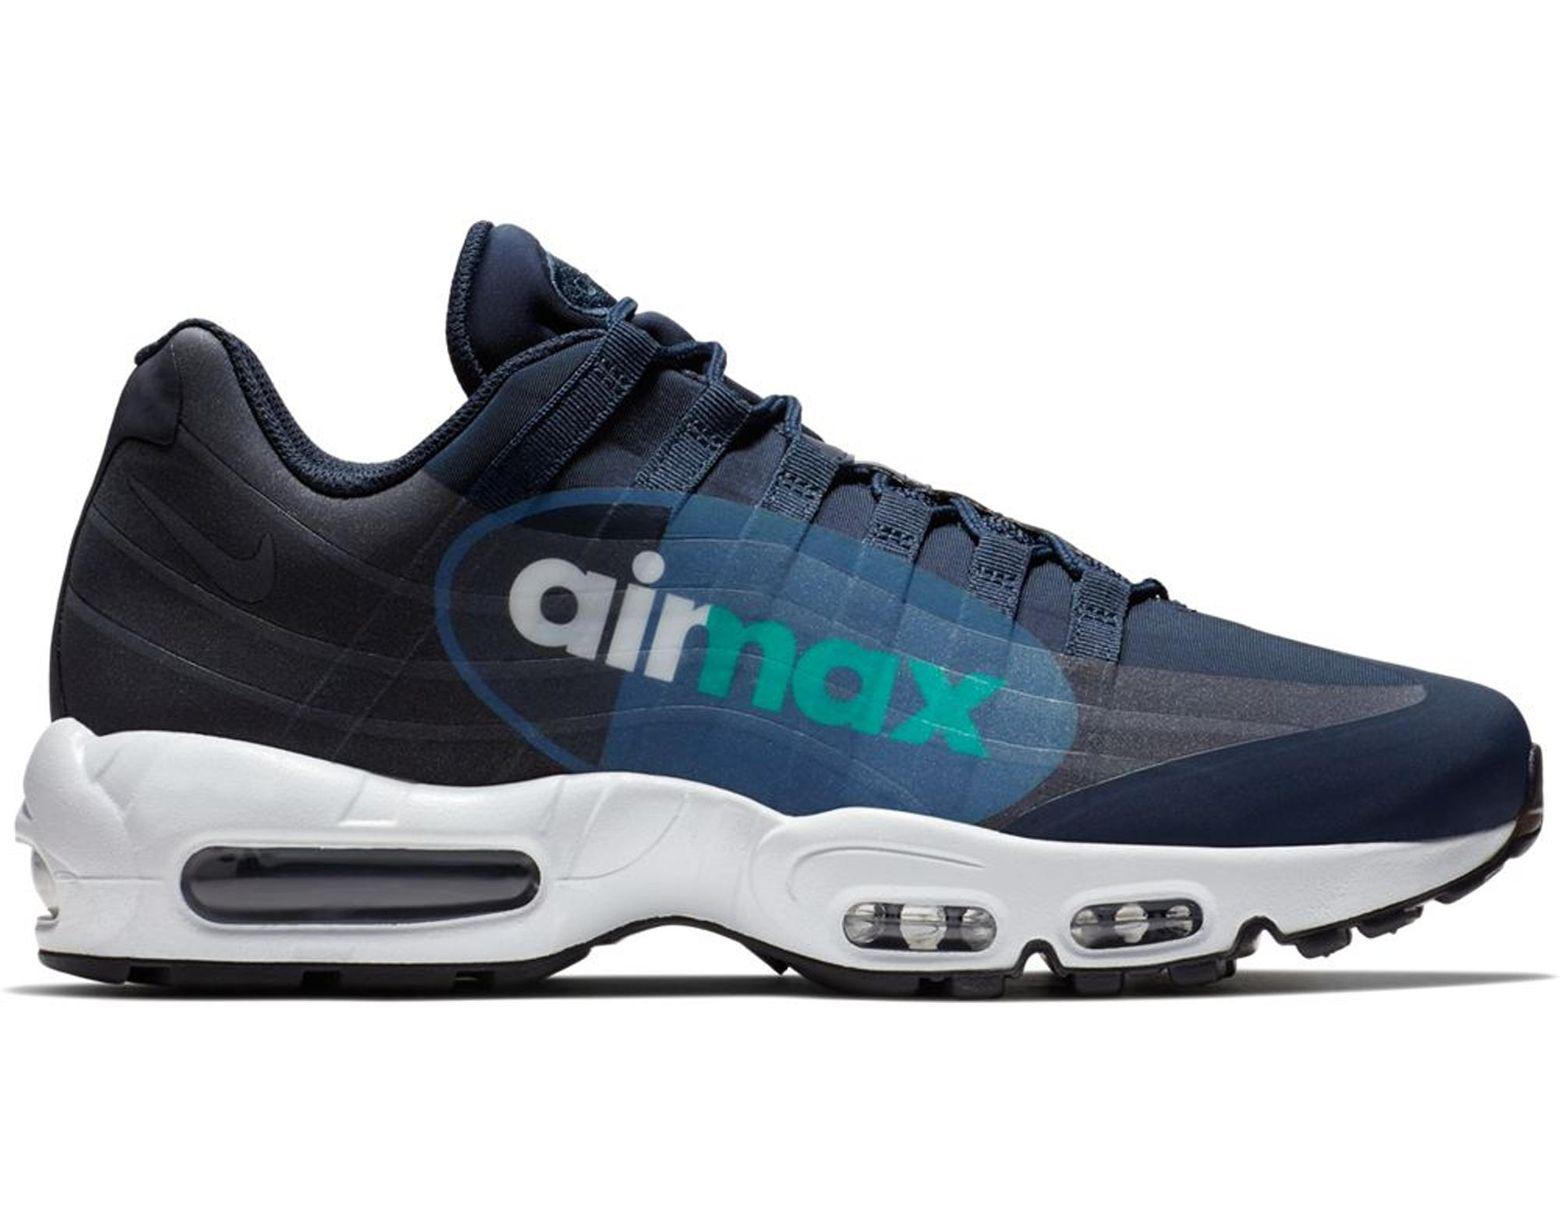 release date 42b87 42b17 Men's Blue Air Max 95 Big Logo Slate